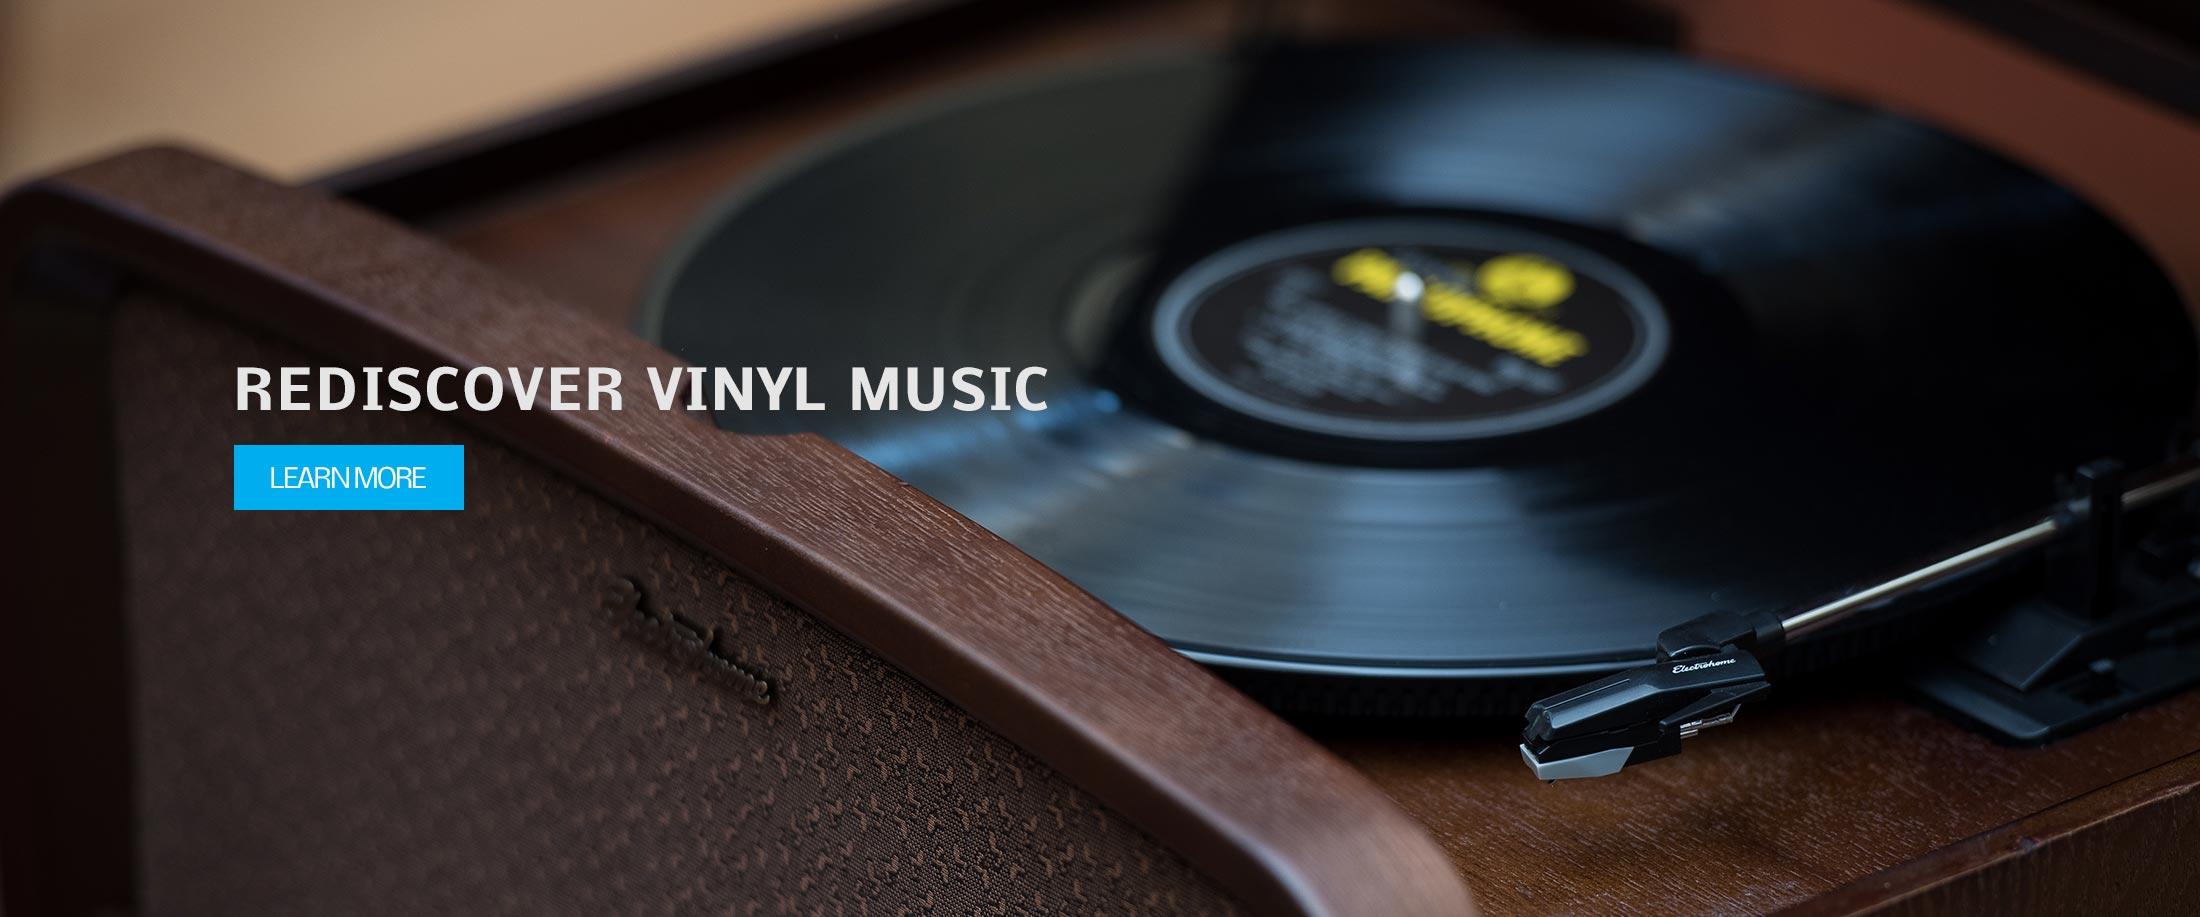 REDISCOVER VINYL MUSIC